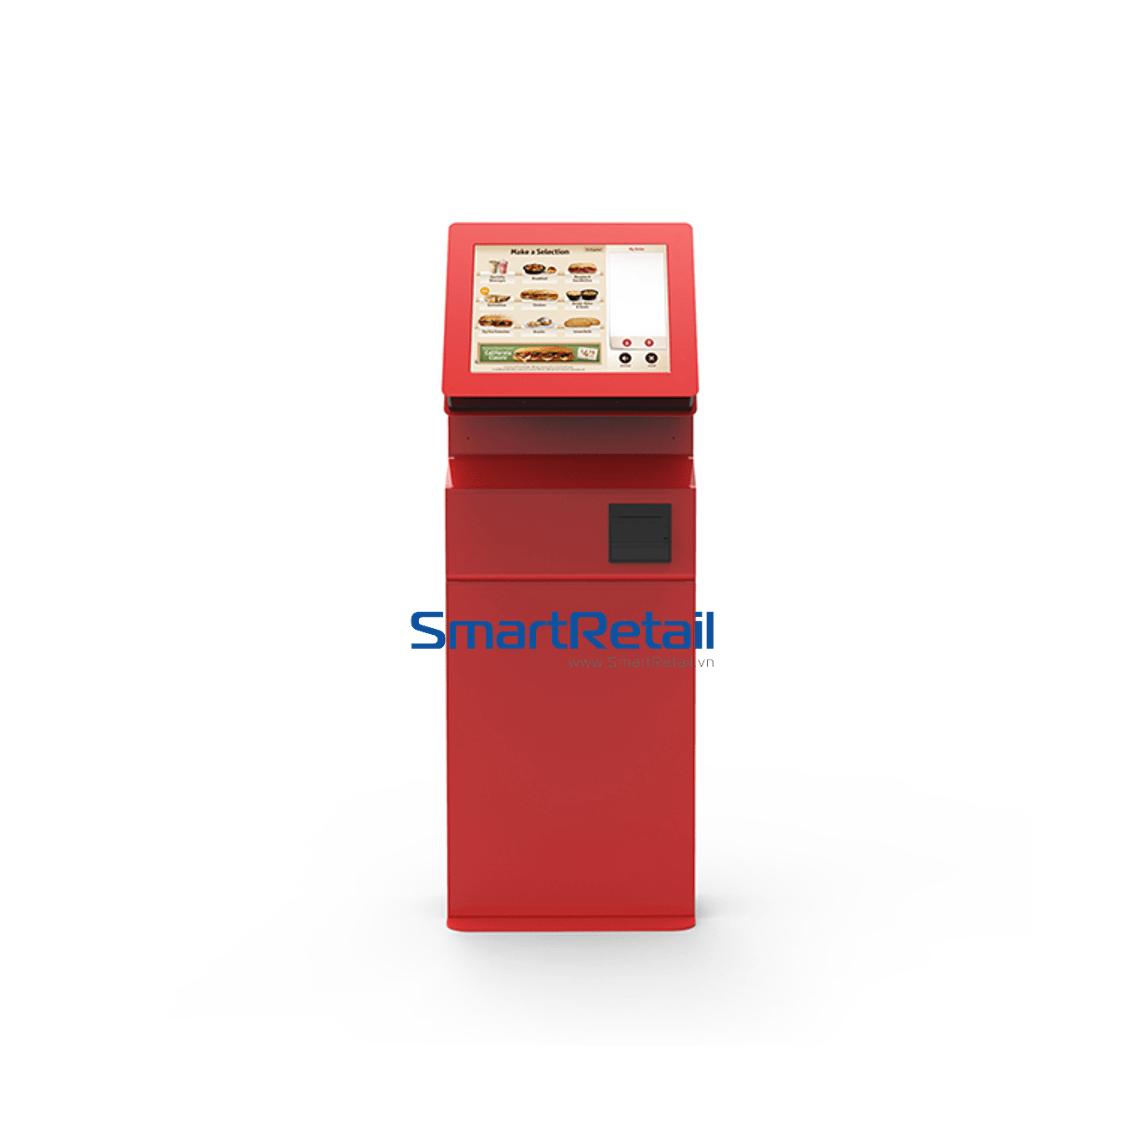 SmartRetail Kiosk Order KSF A119 S4 1